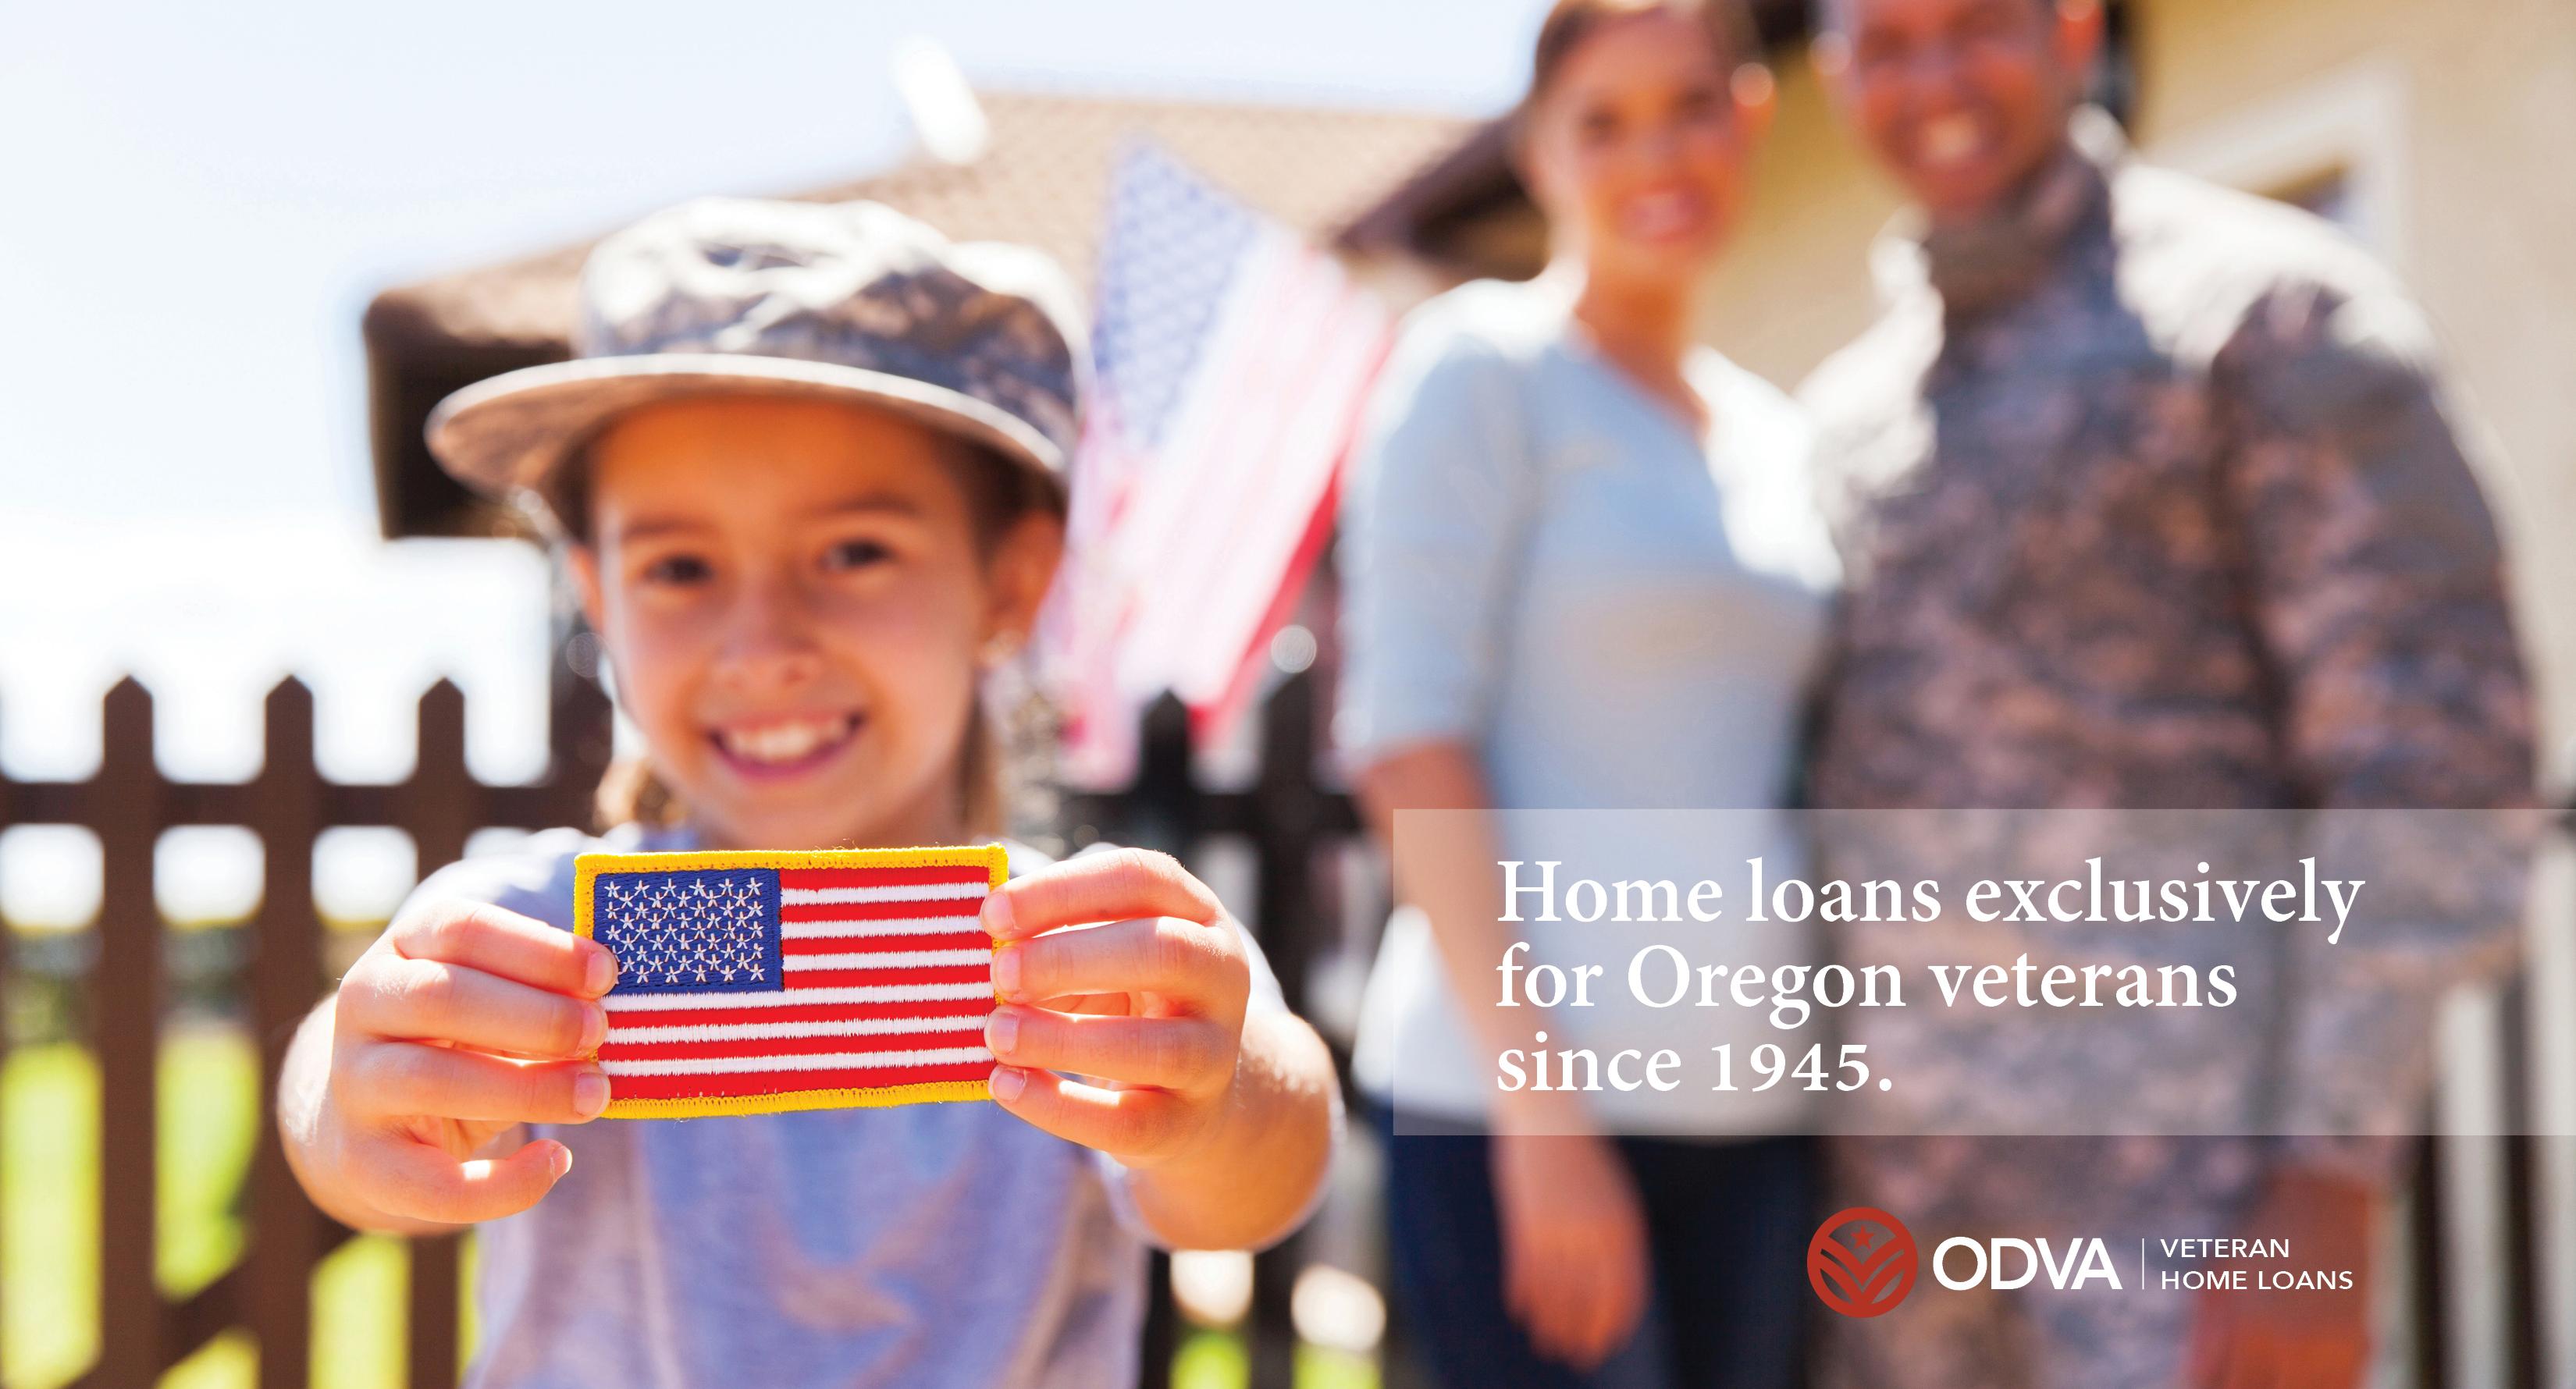 Odva Home Loans